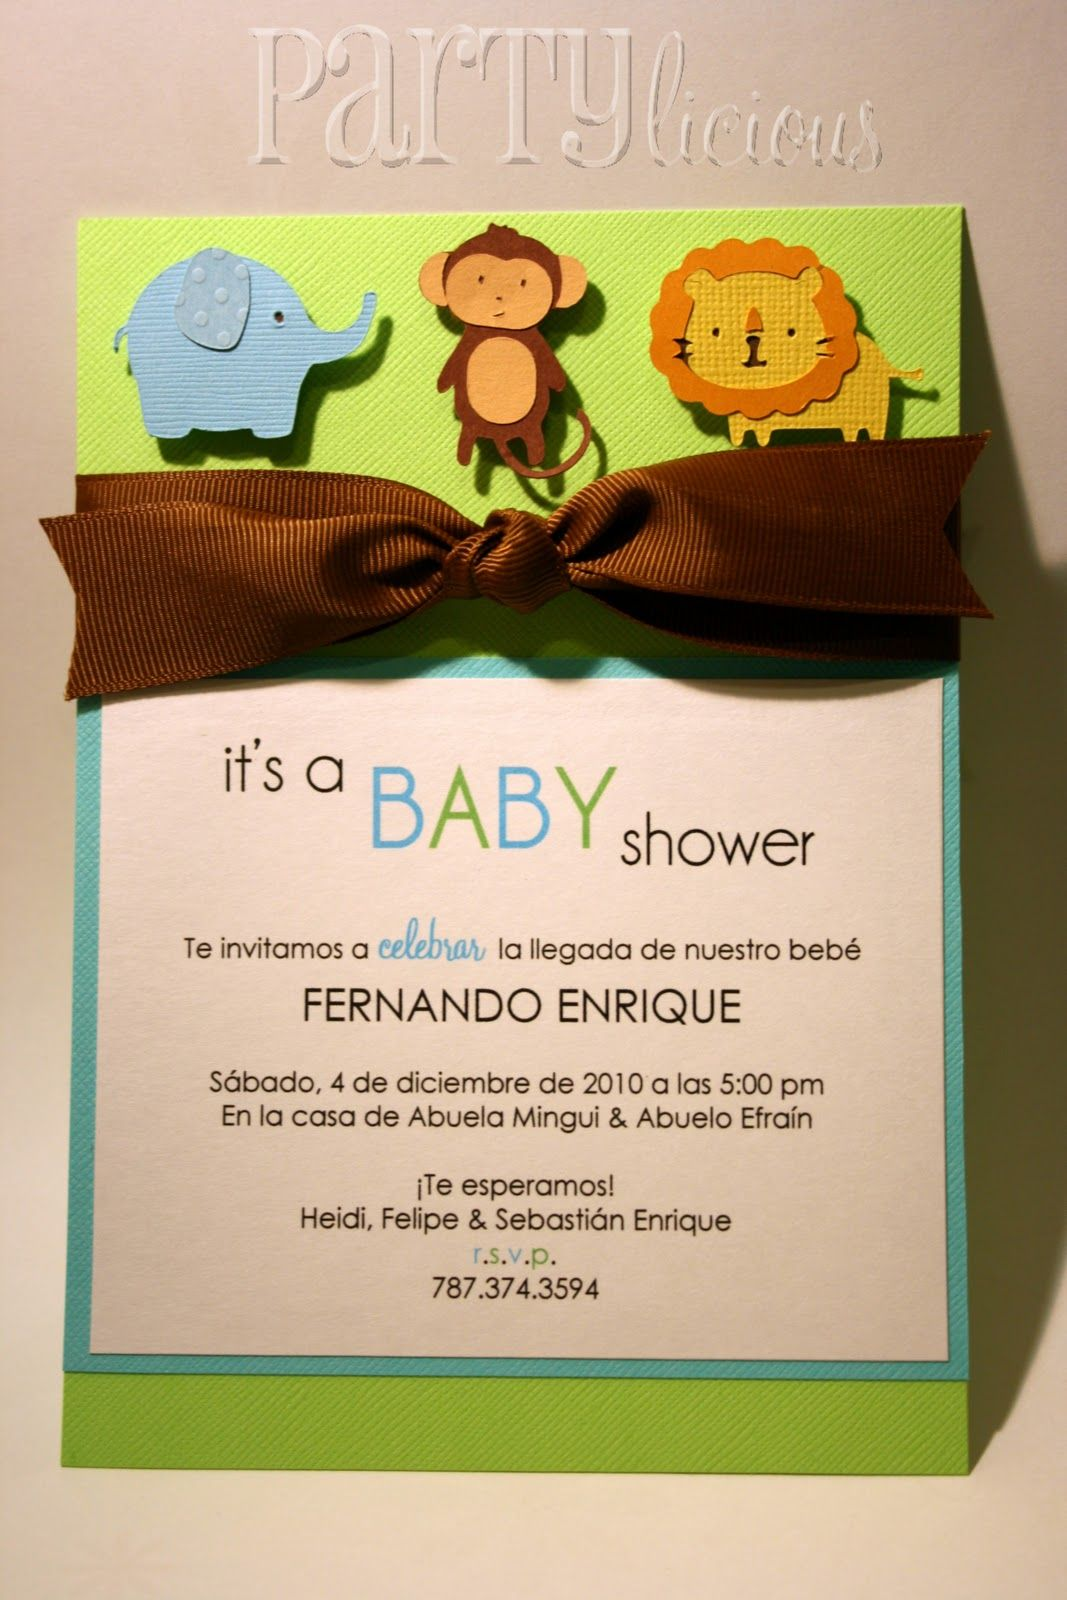 handmade monkey invitations for boys | Partylicious: {Partylicious ...